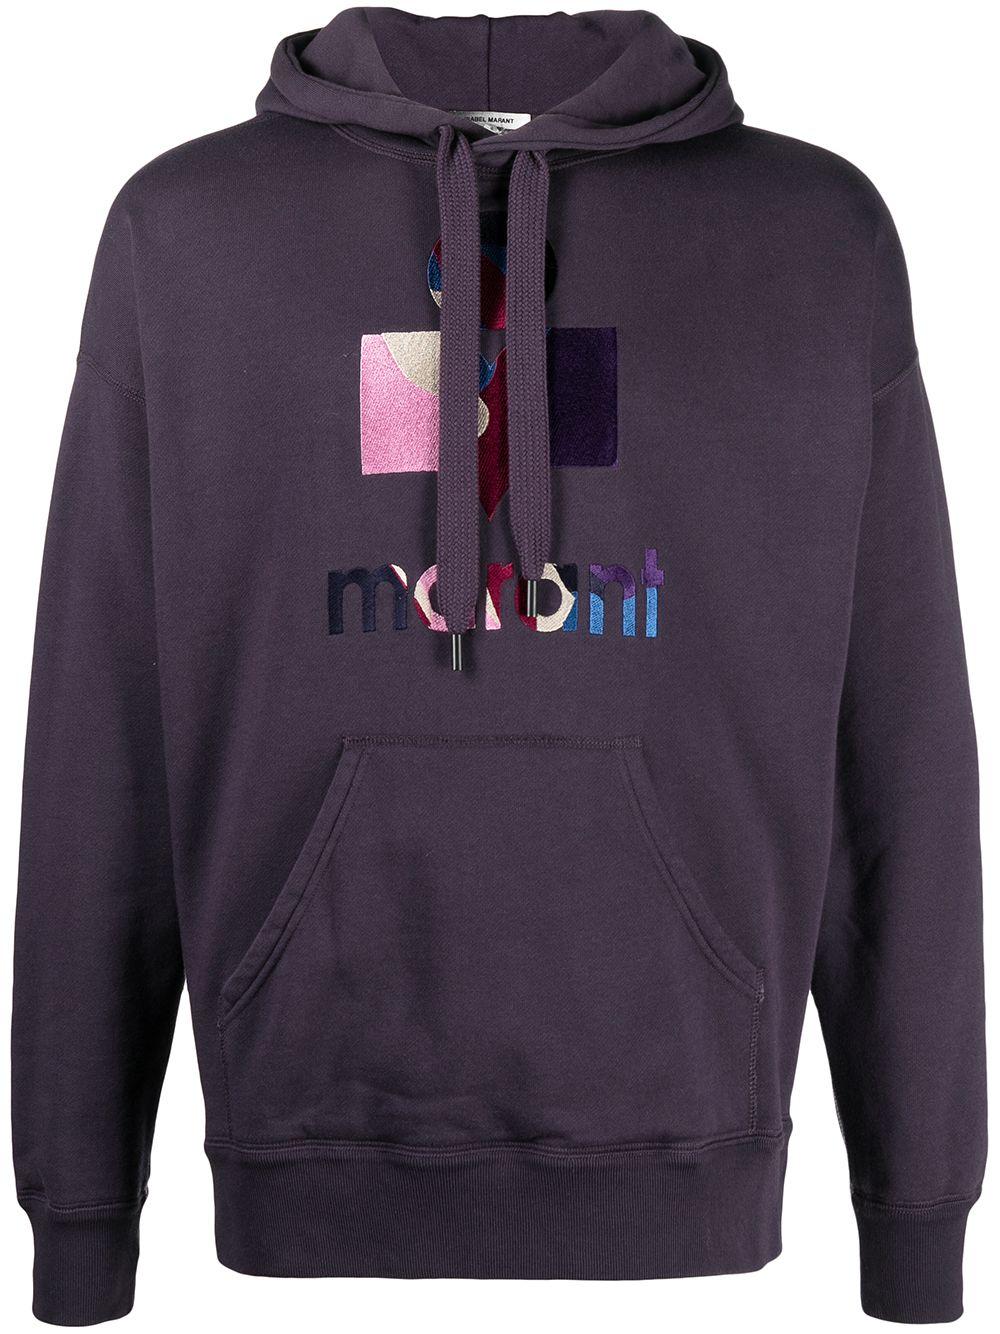 Miley logo sweatshirt Black Man Cotton ISABEL MARANT | Sweatshirts | SW0055-21P030H30FN